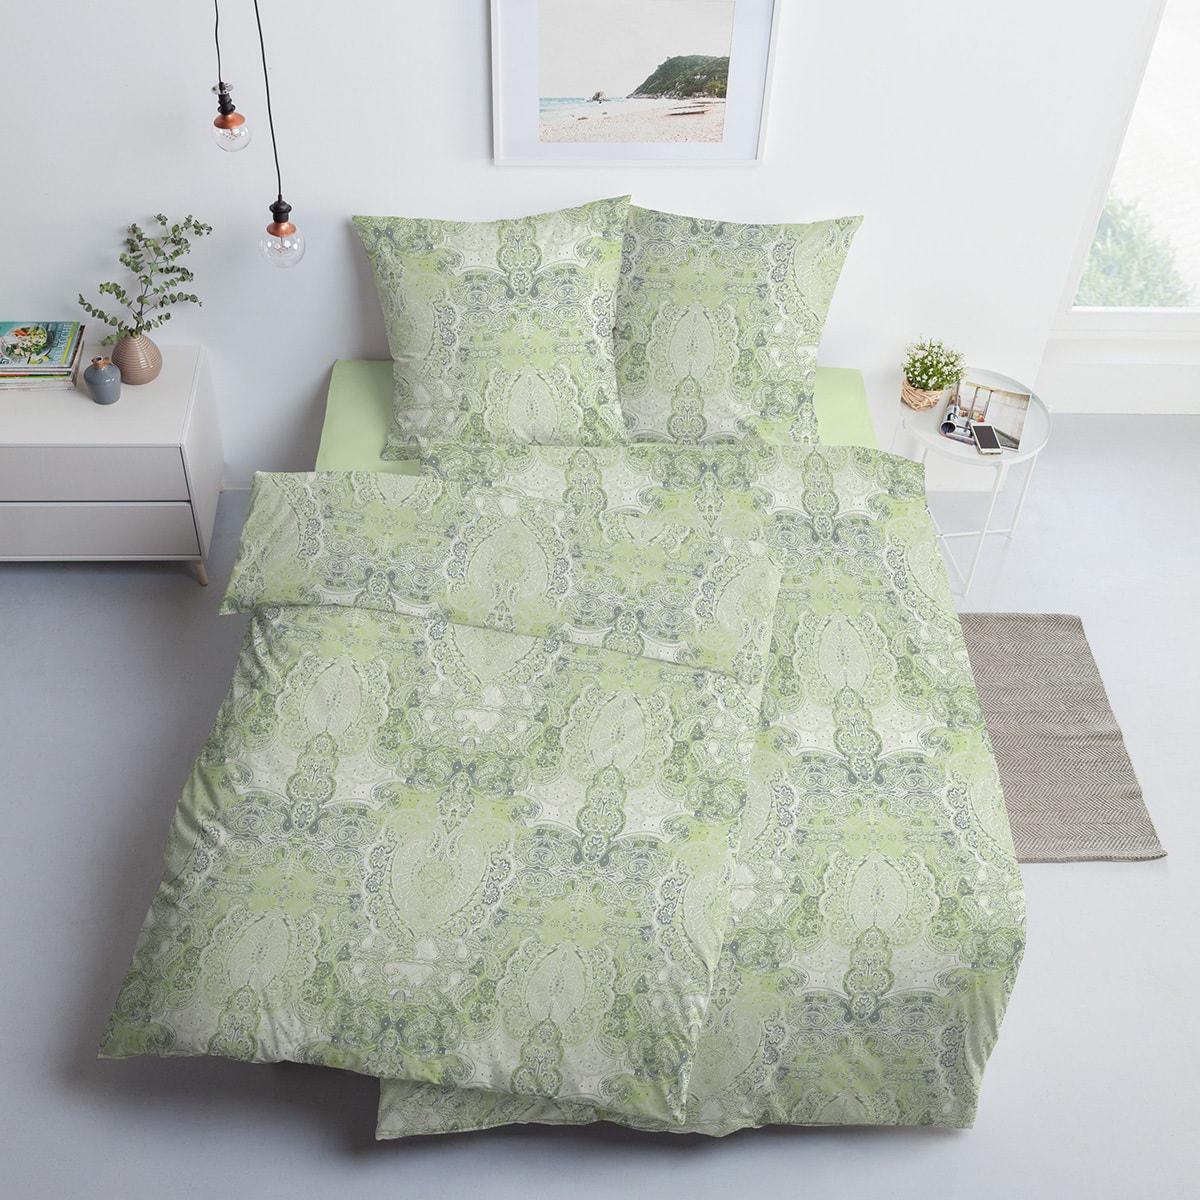 estella mako interlock jersey bettw sche 6217 550 reseda. Black Bedroom Furniture Sets. Home Design Ideas